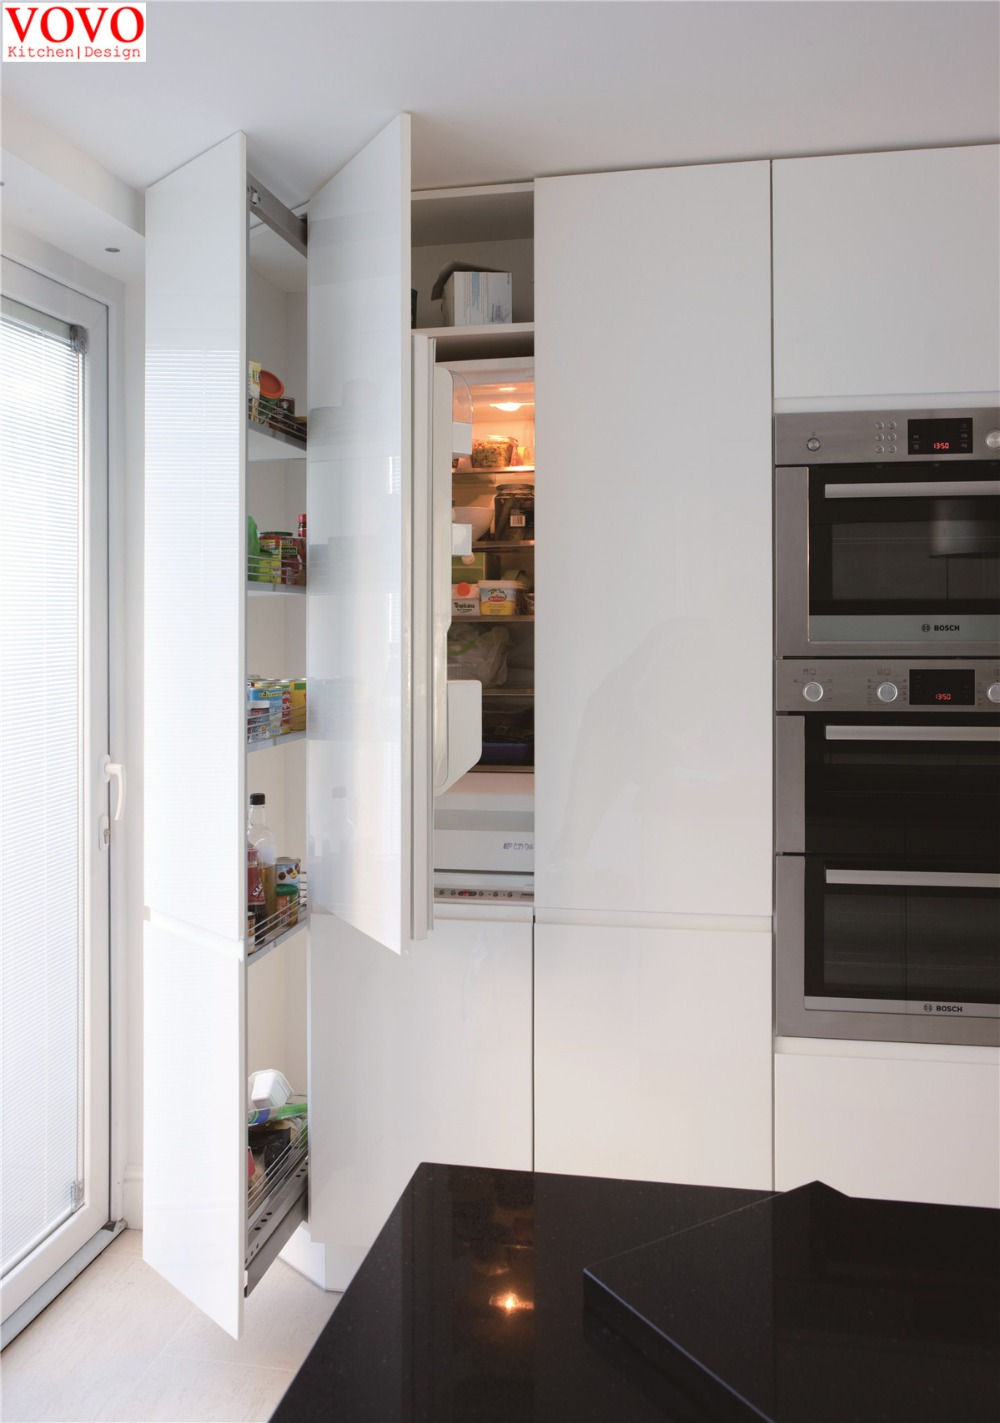 acquista all'ingrosso online armadio da cucina in stile moderno da ... - Moderni Stili Armadio Cucina